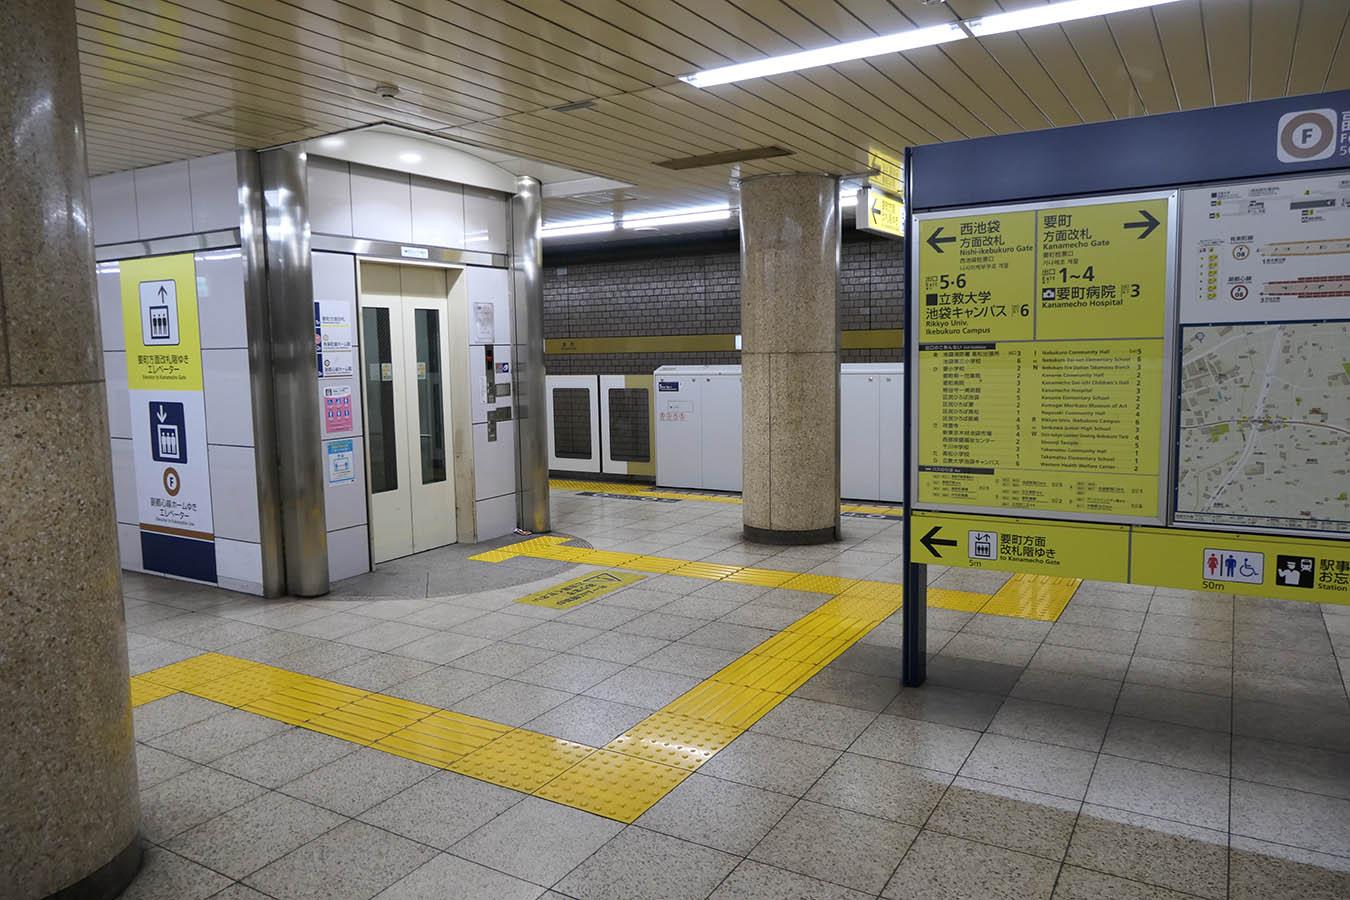 Y08_photo02.jpg